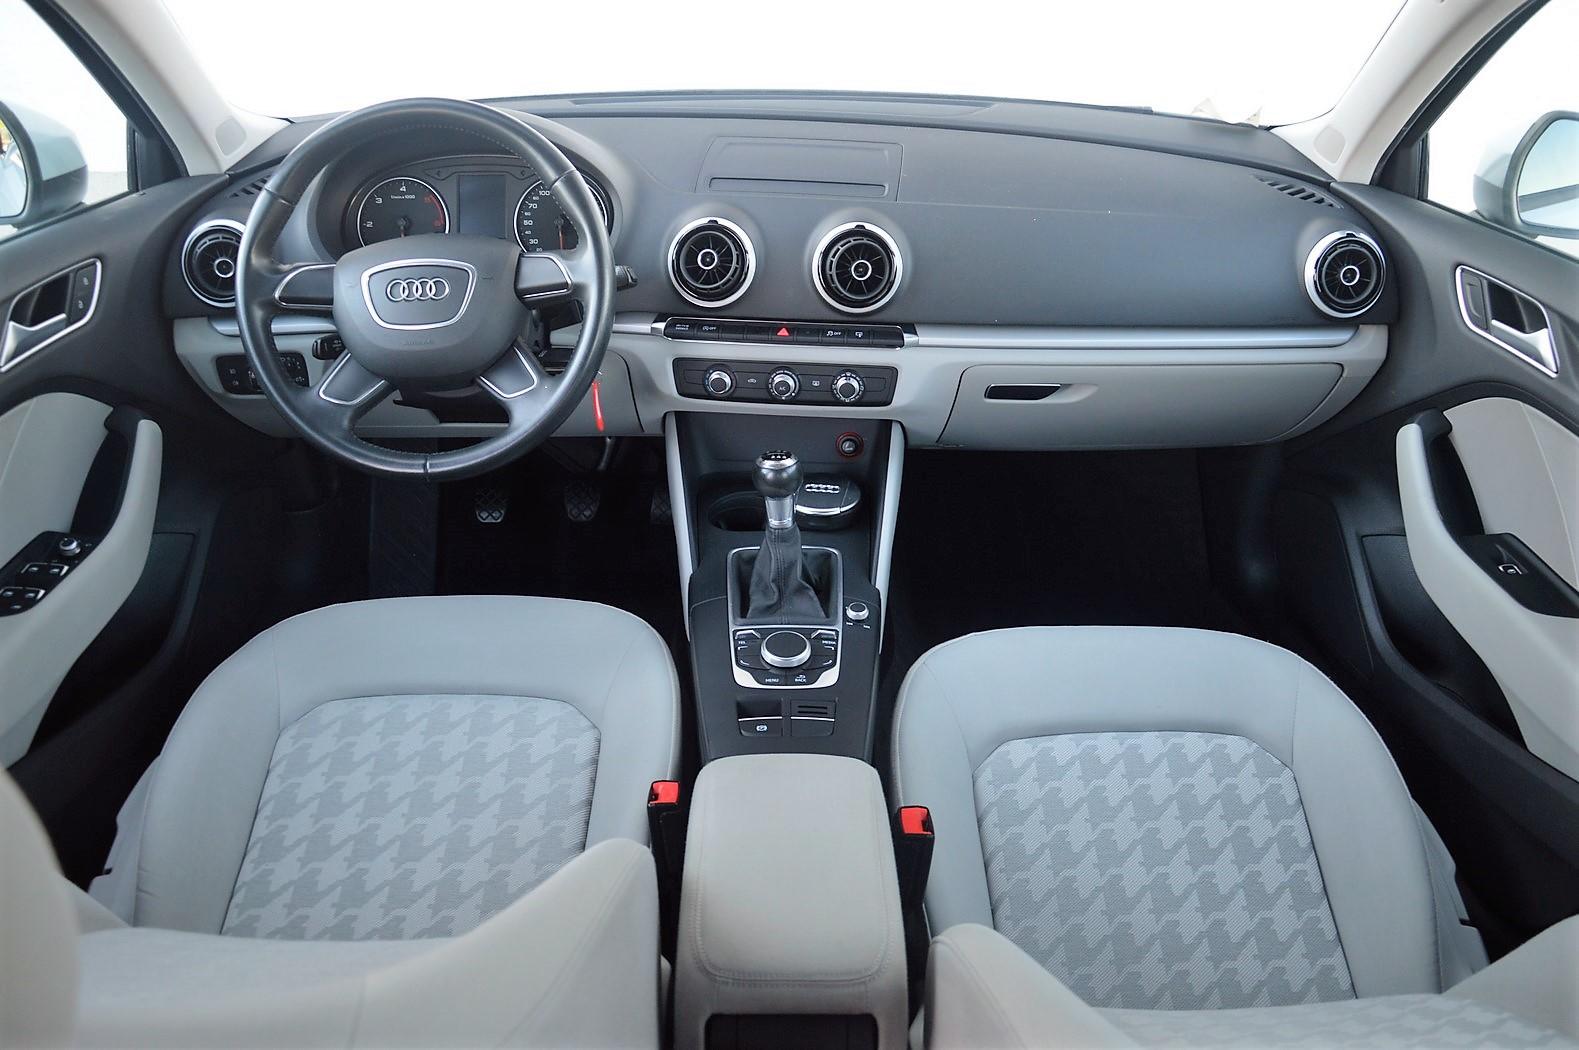 audi a3 hatchback 2015 second hand 2 766 eur avans leasing auto. Black Bedroom Furniture Sets. Home Design Ideas